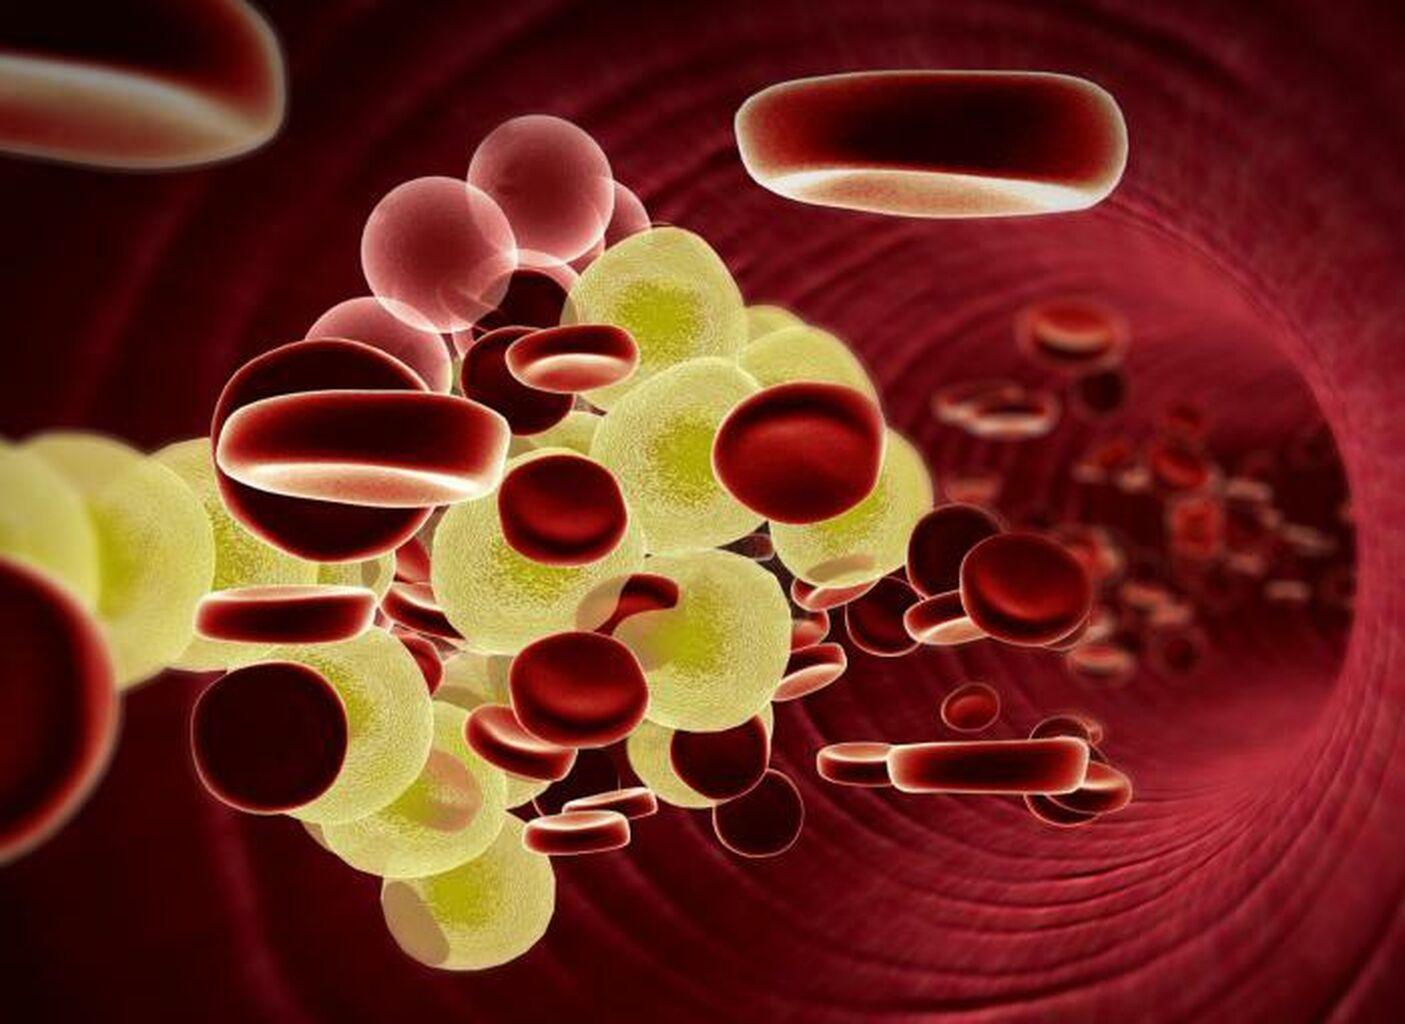 colesterol hdl o de alta densidad